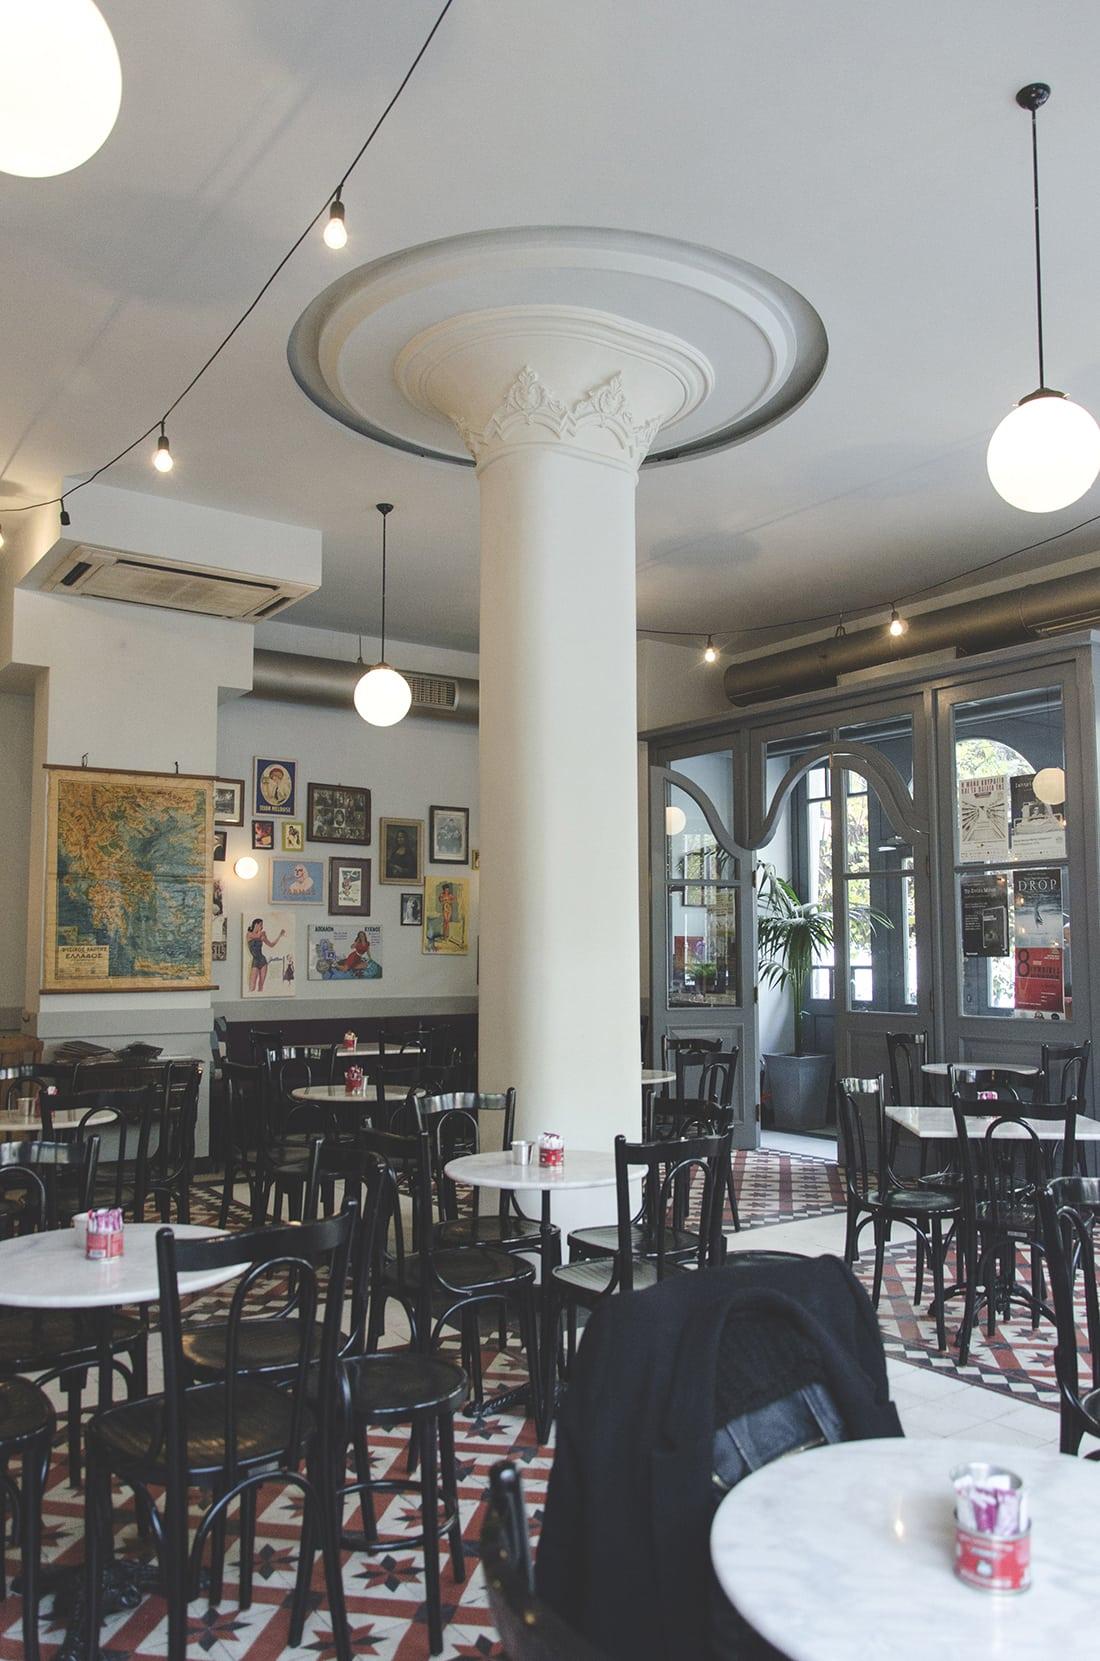 Youkali: Ένα καφενείο από το παρελθόν στο κέντρο της Θεσσαλονίκης!